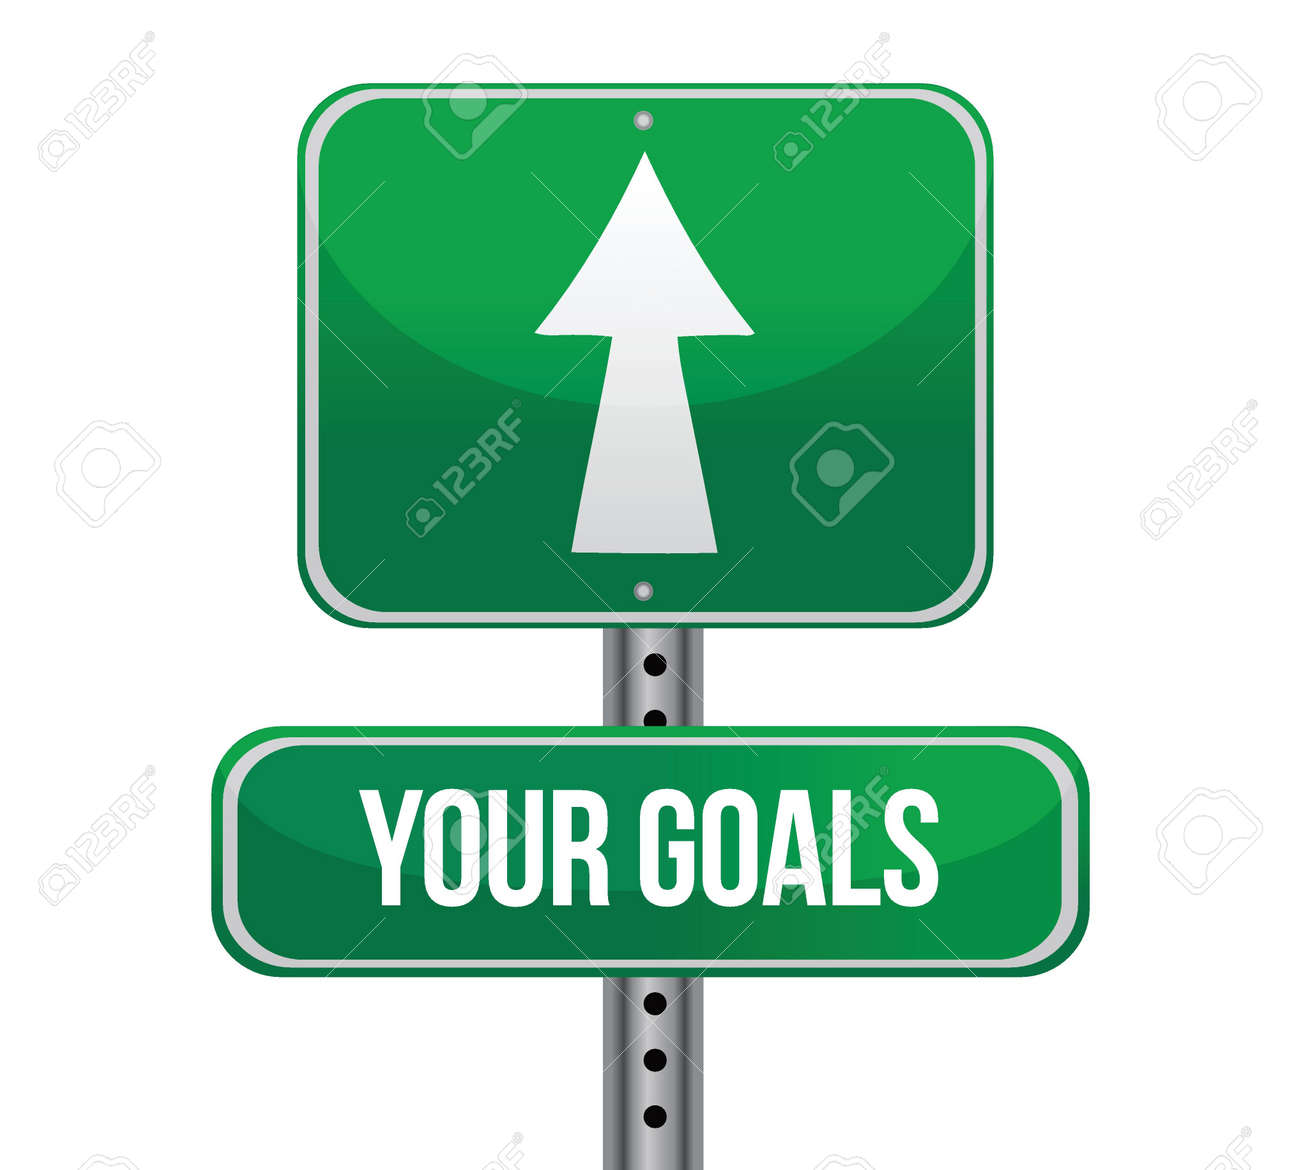 Your Goals Green Road Sign illustration design Stock Vector - 17124374